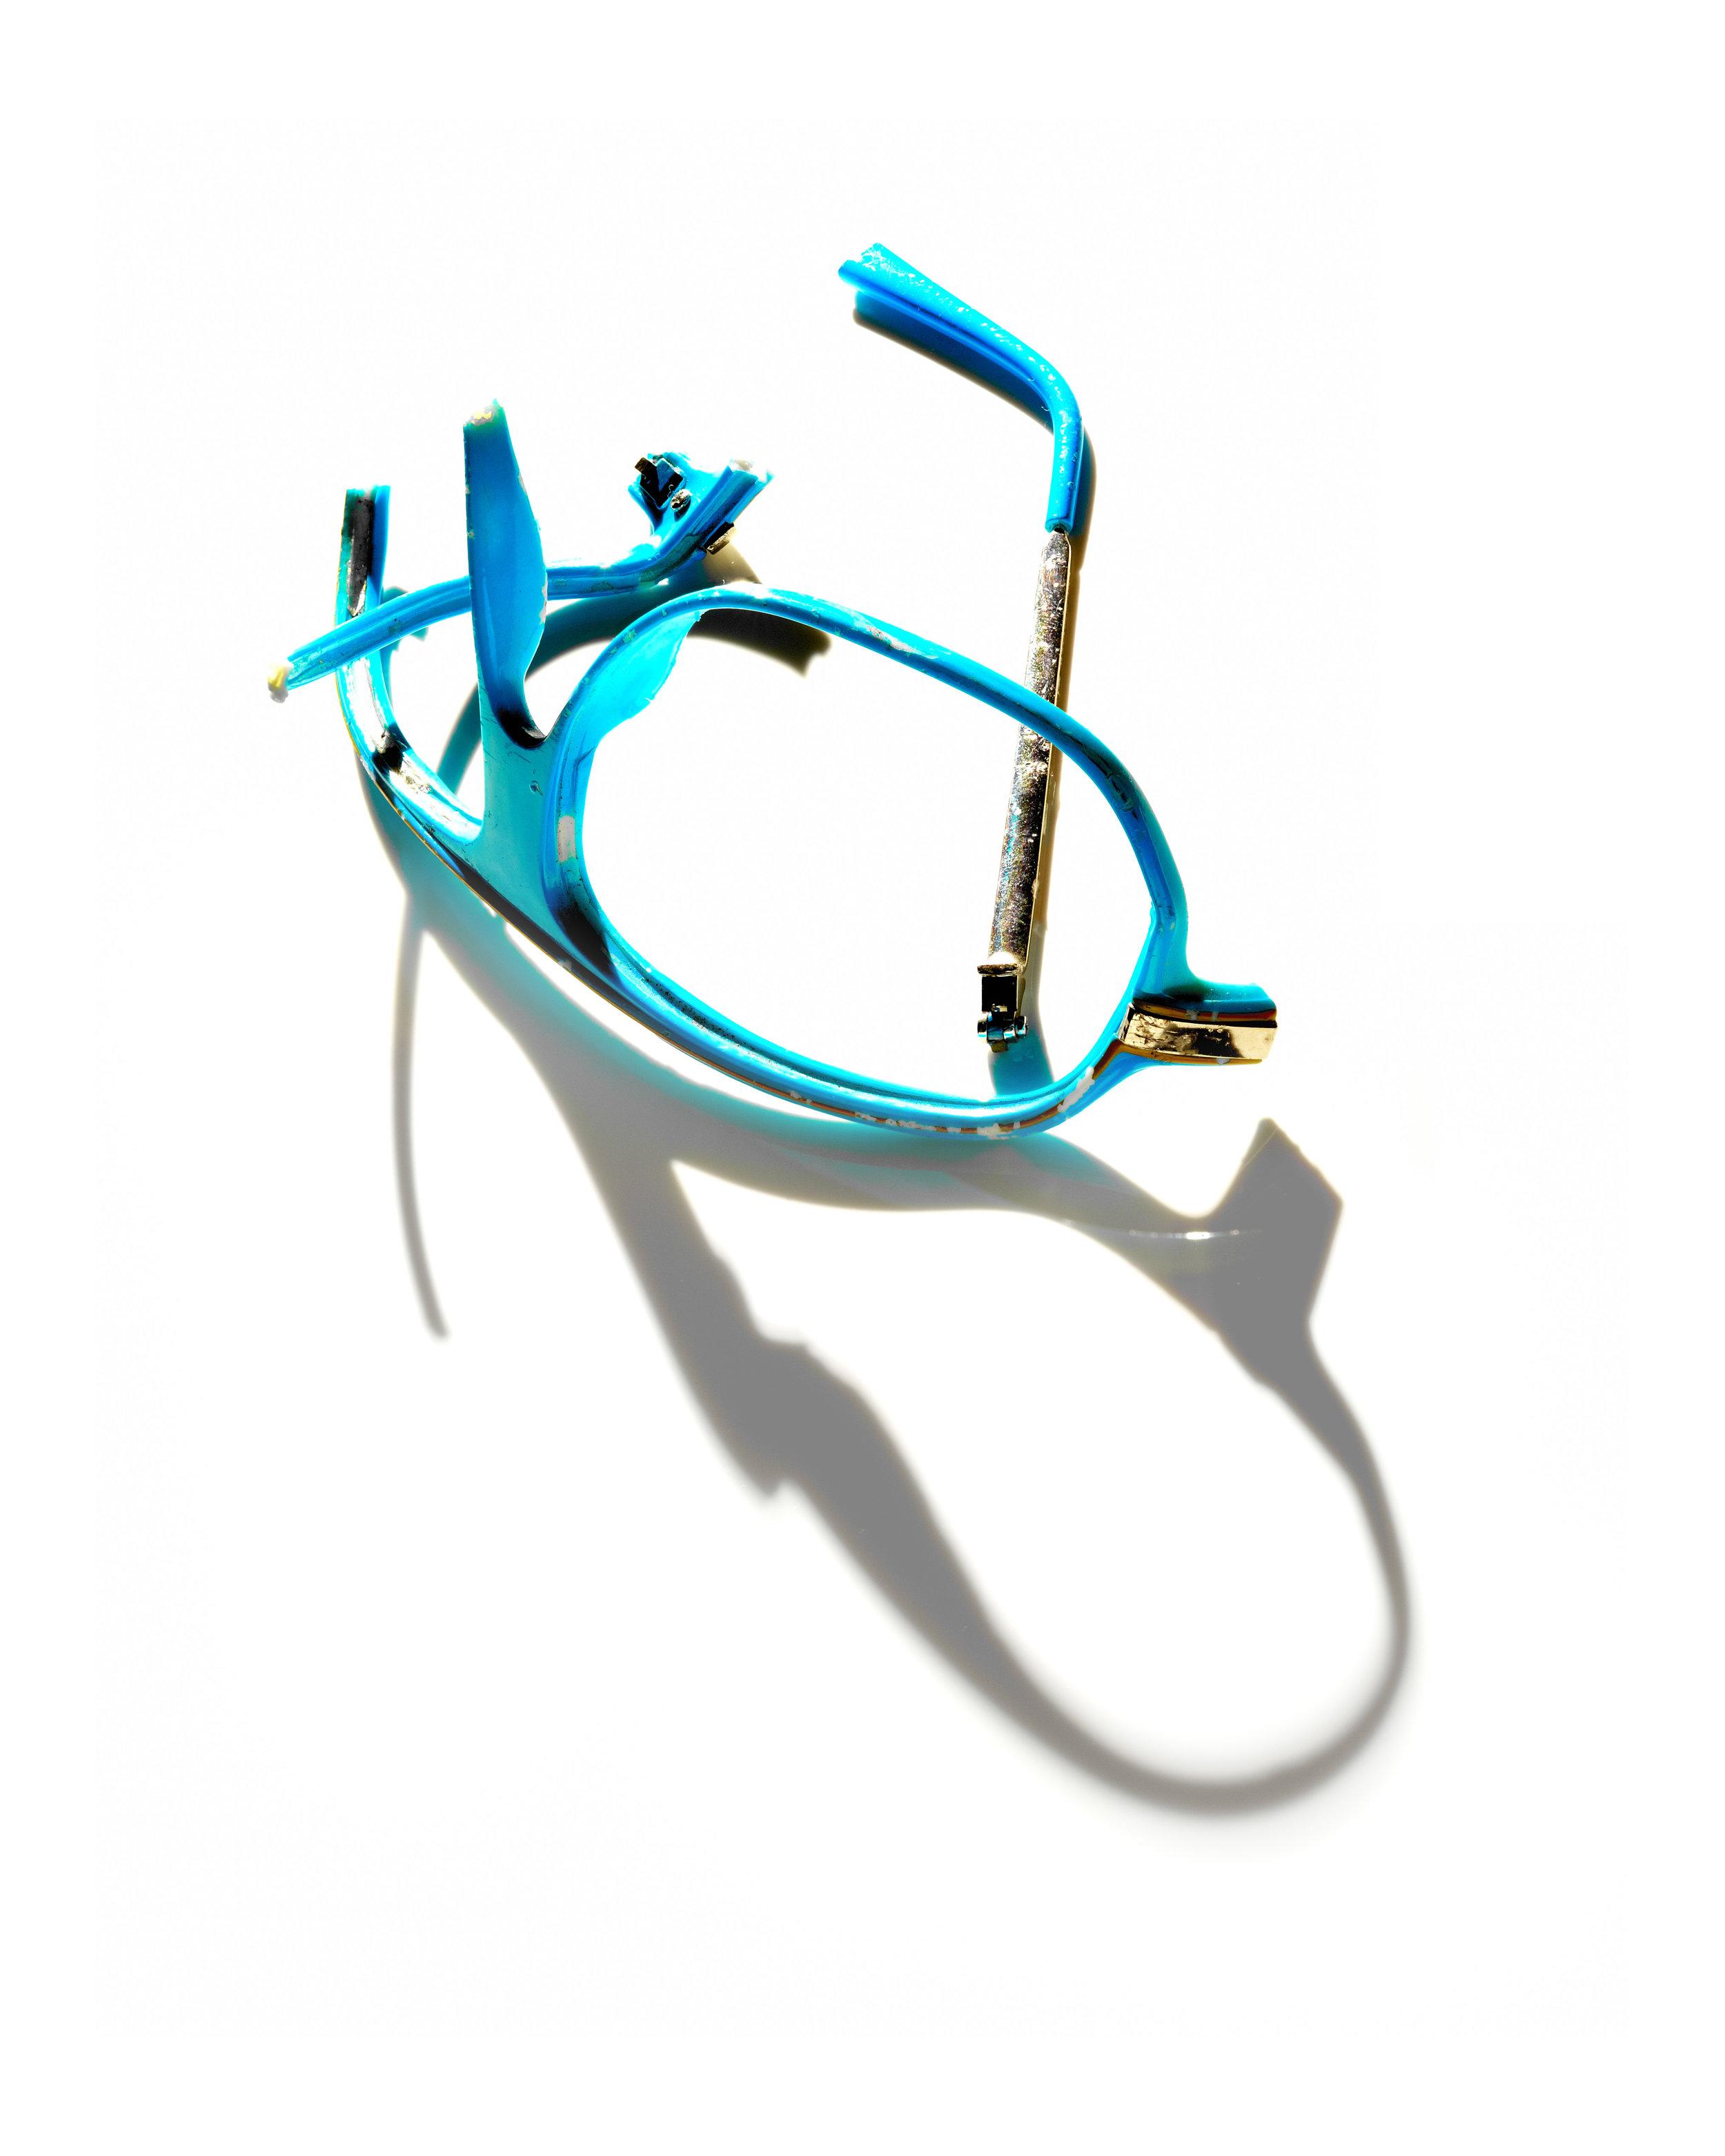 TealGlasses02.15.12 0930.jpg